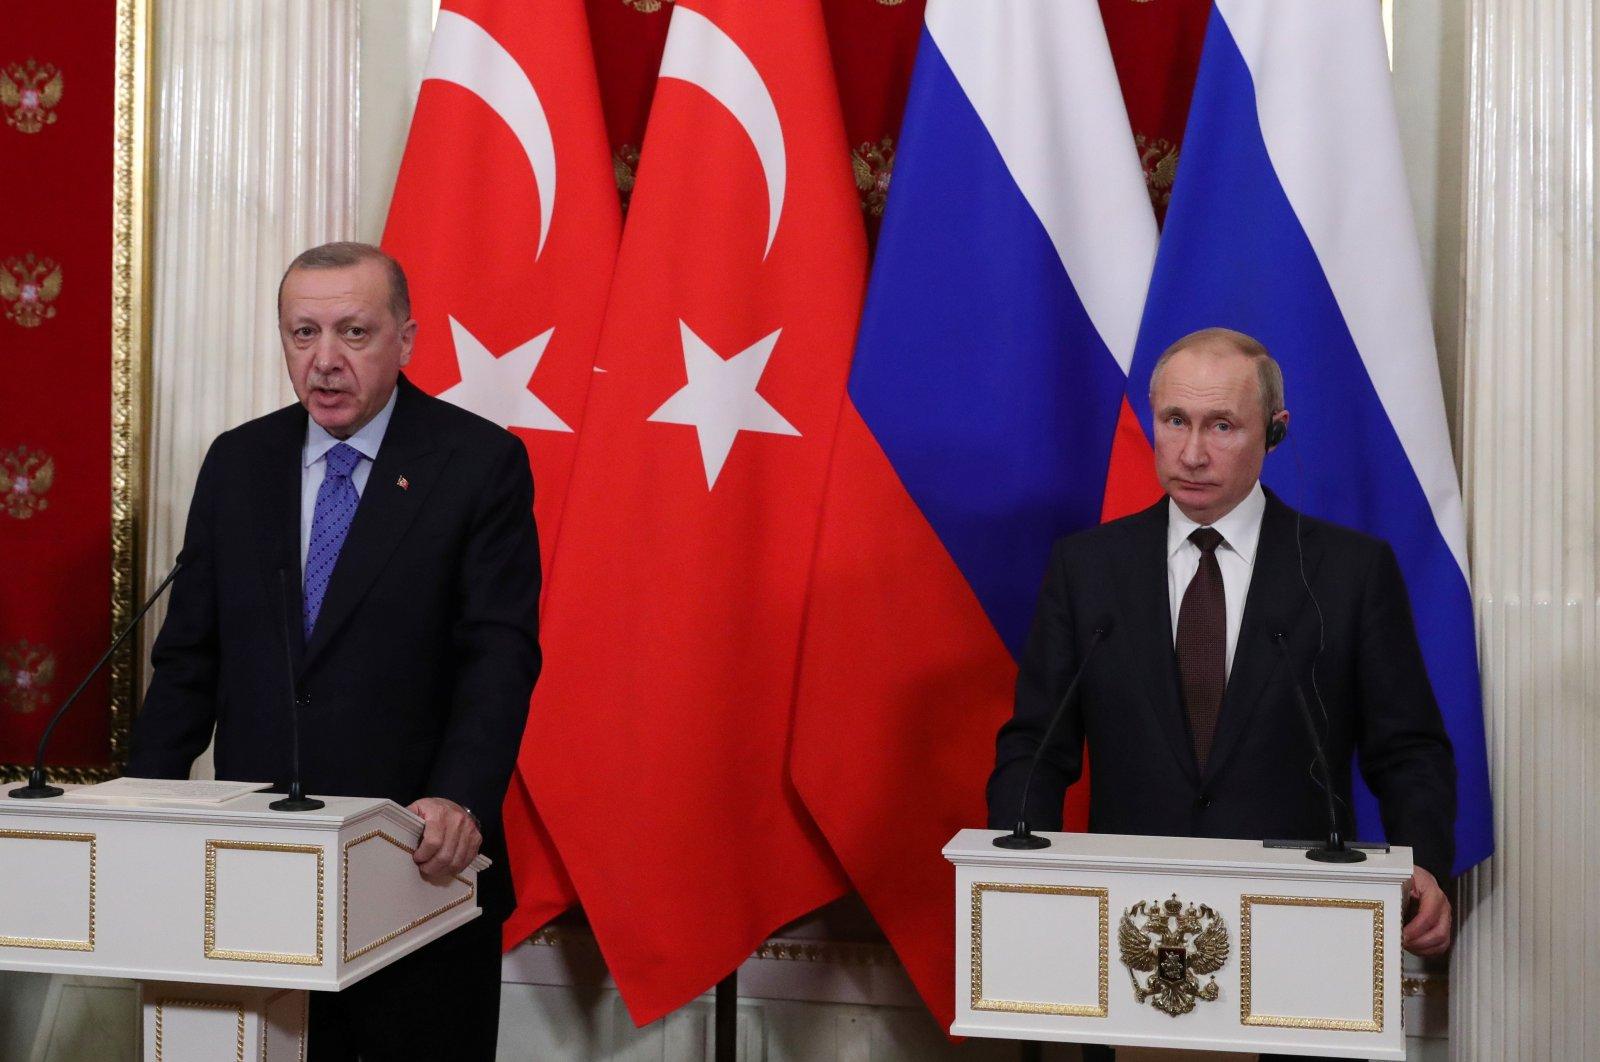 President Recep Tayyip Erdoğan (L) and his Russian counterpart Vladimir Putin attend a news conference following their talks in Moscow, Russia March 5, 2020. (Sputnik / Mikhail Klimentyev / Kremlin via Reuters)